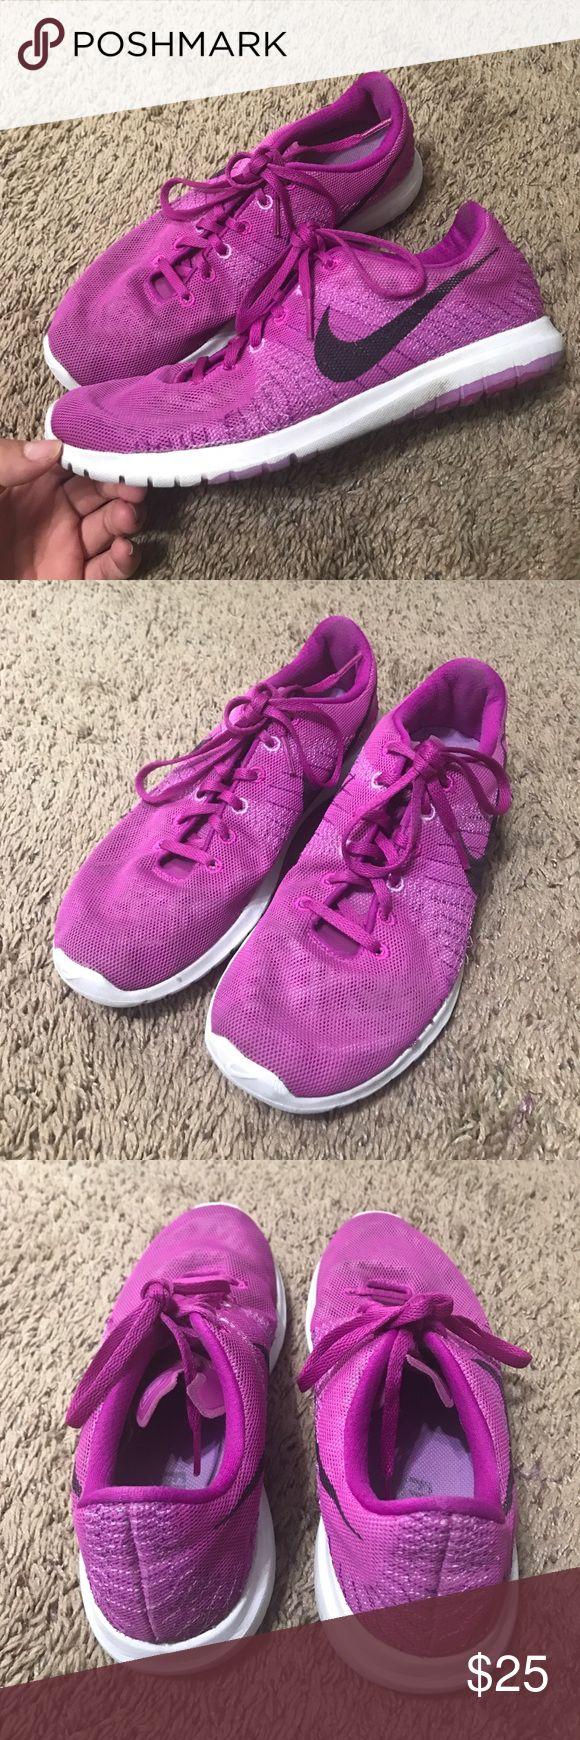 🚨SALE🚨Nike fury In good used shape bottoms show wear Nike Shoes